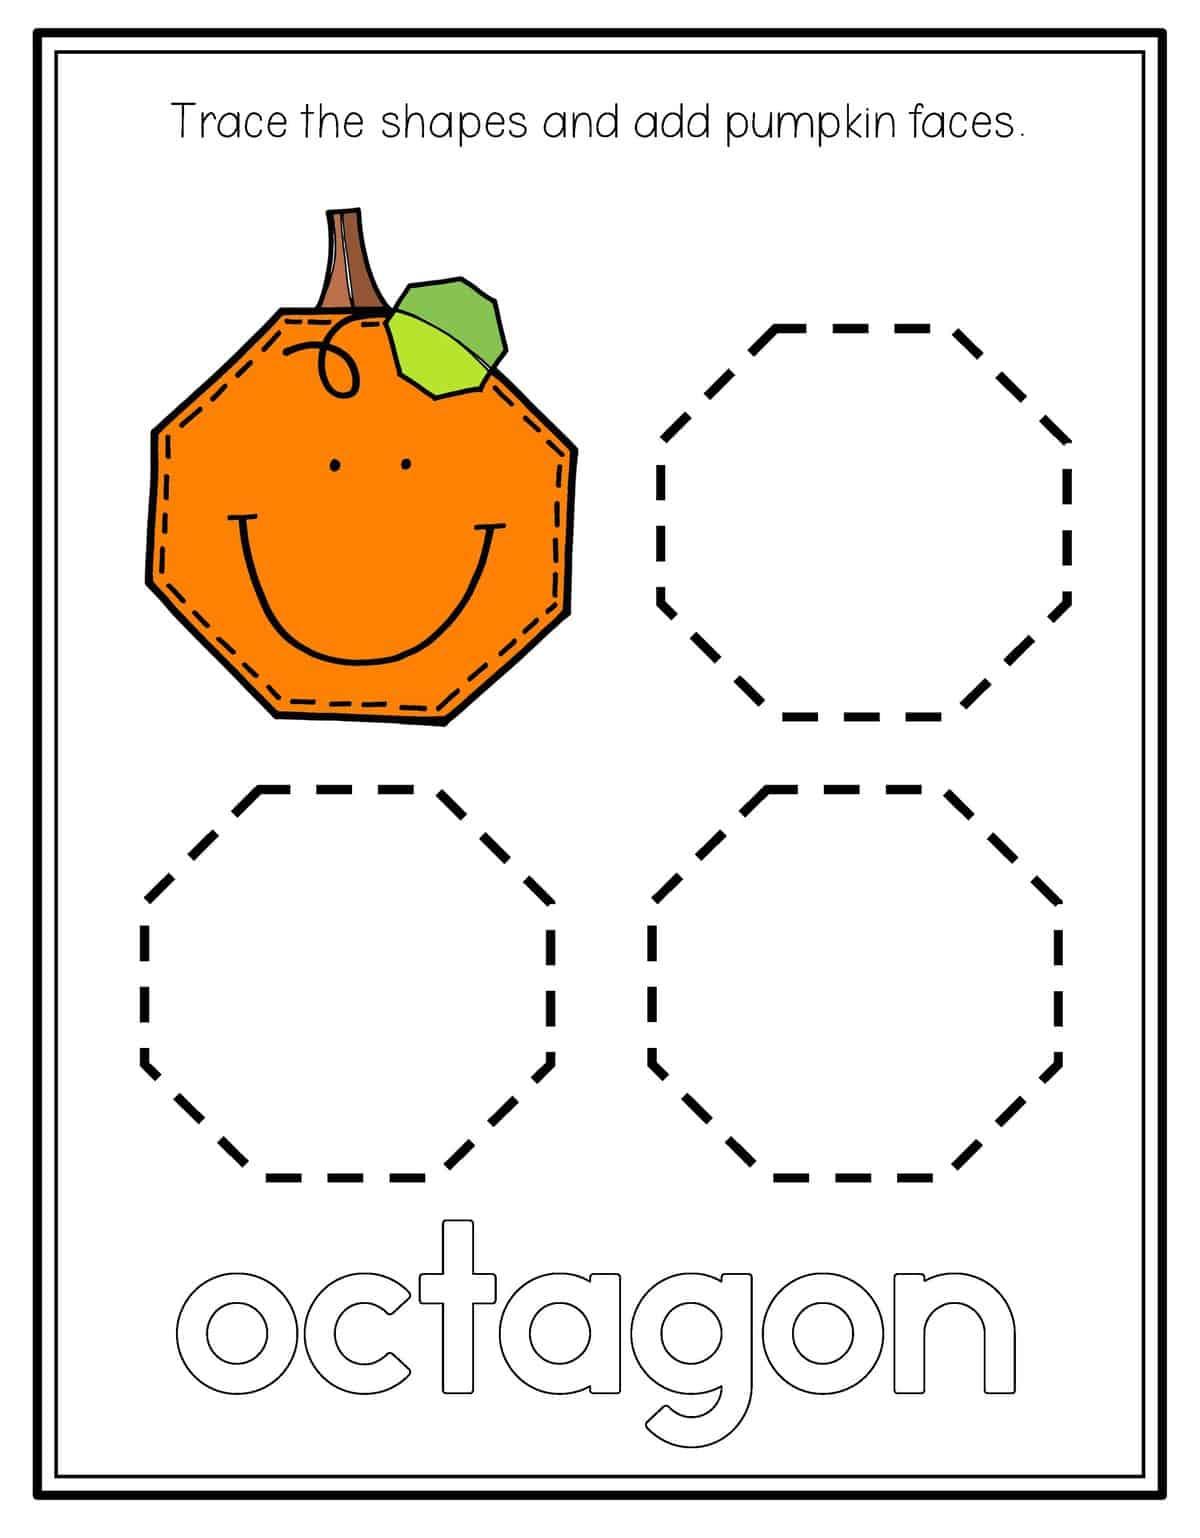 Octagon Shape Preschool Worksheets | Printable Worksheets